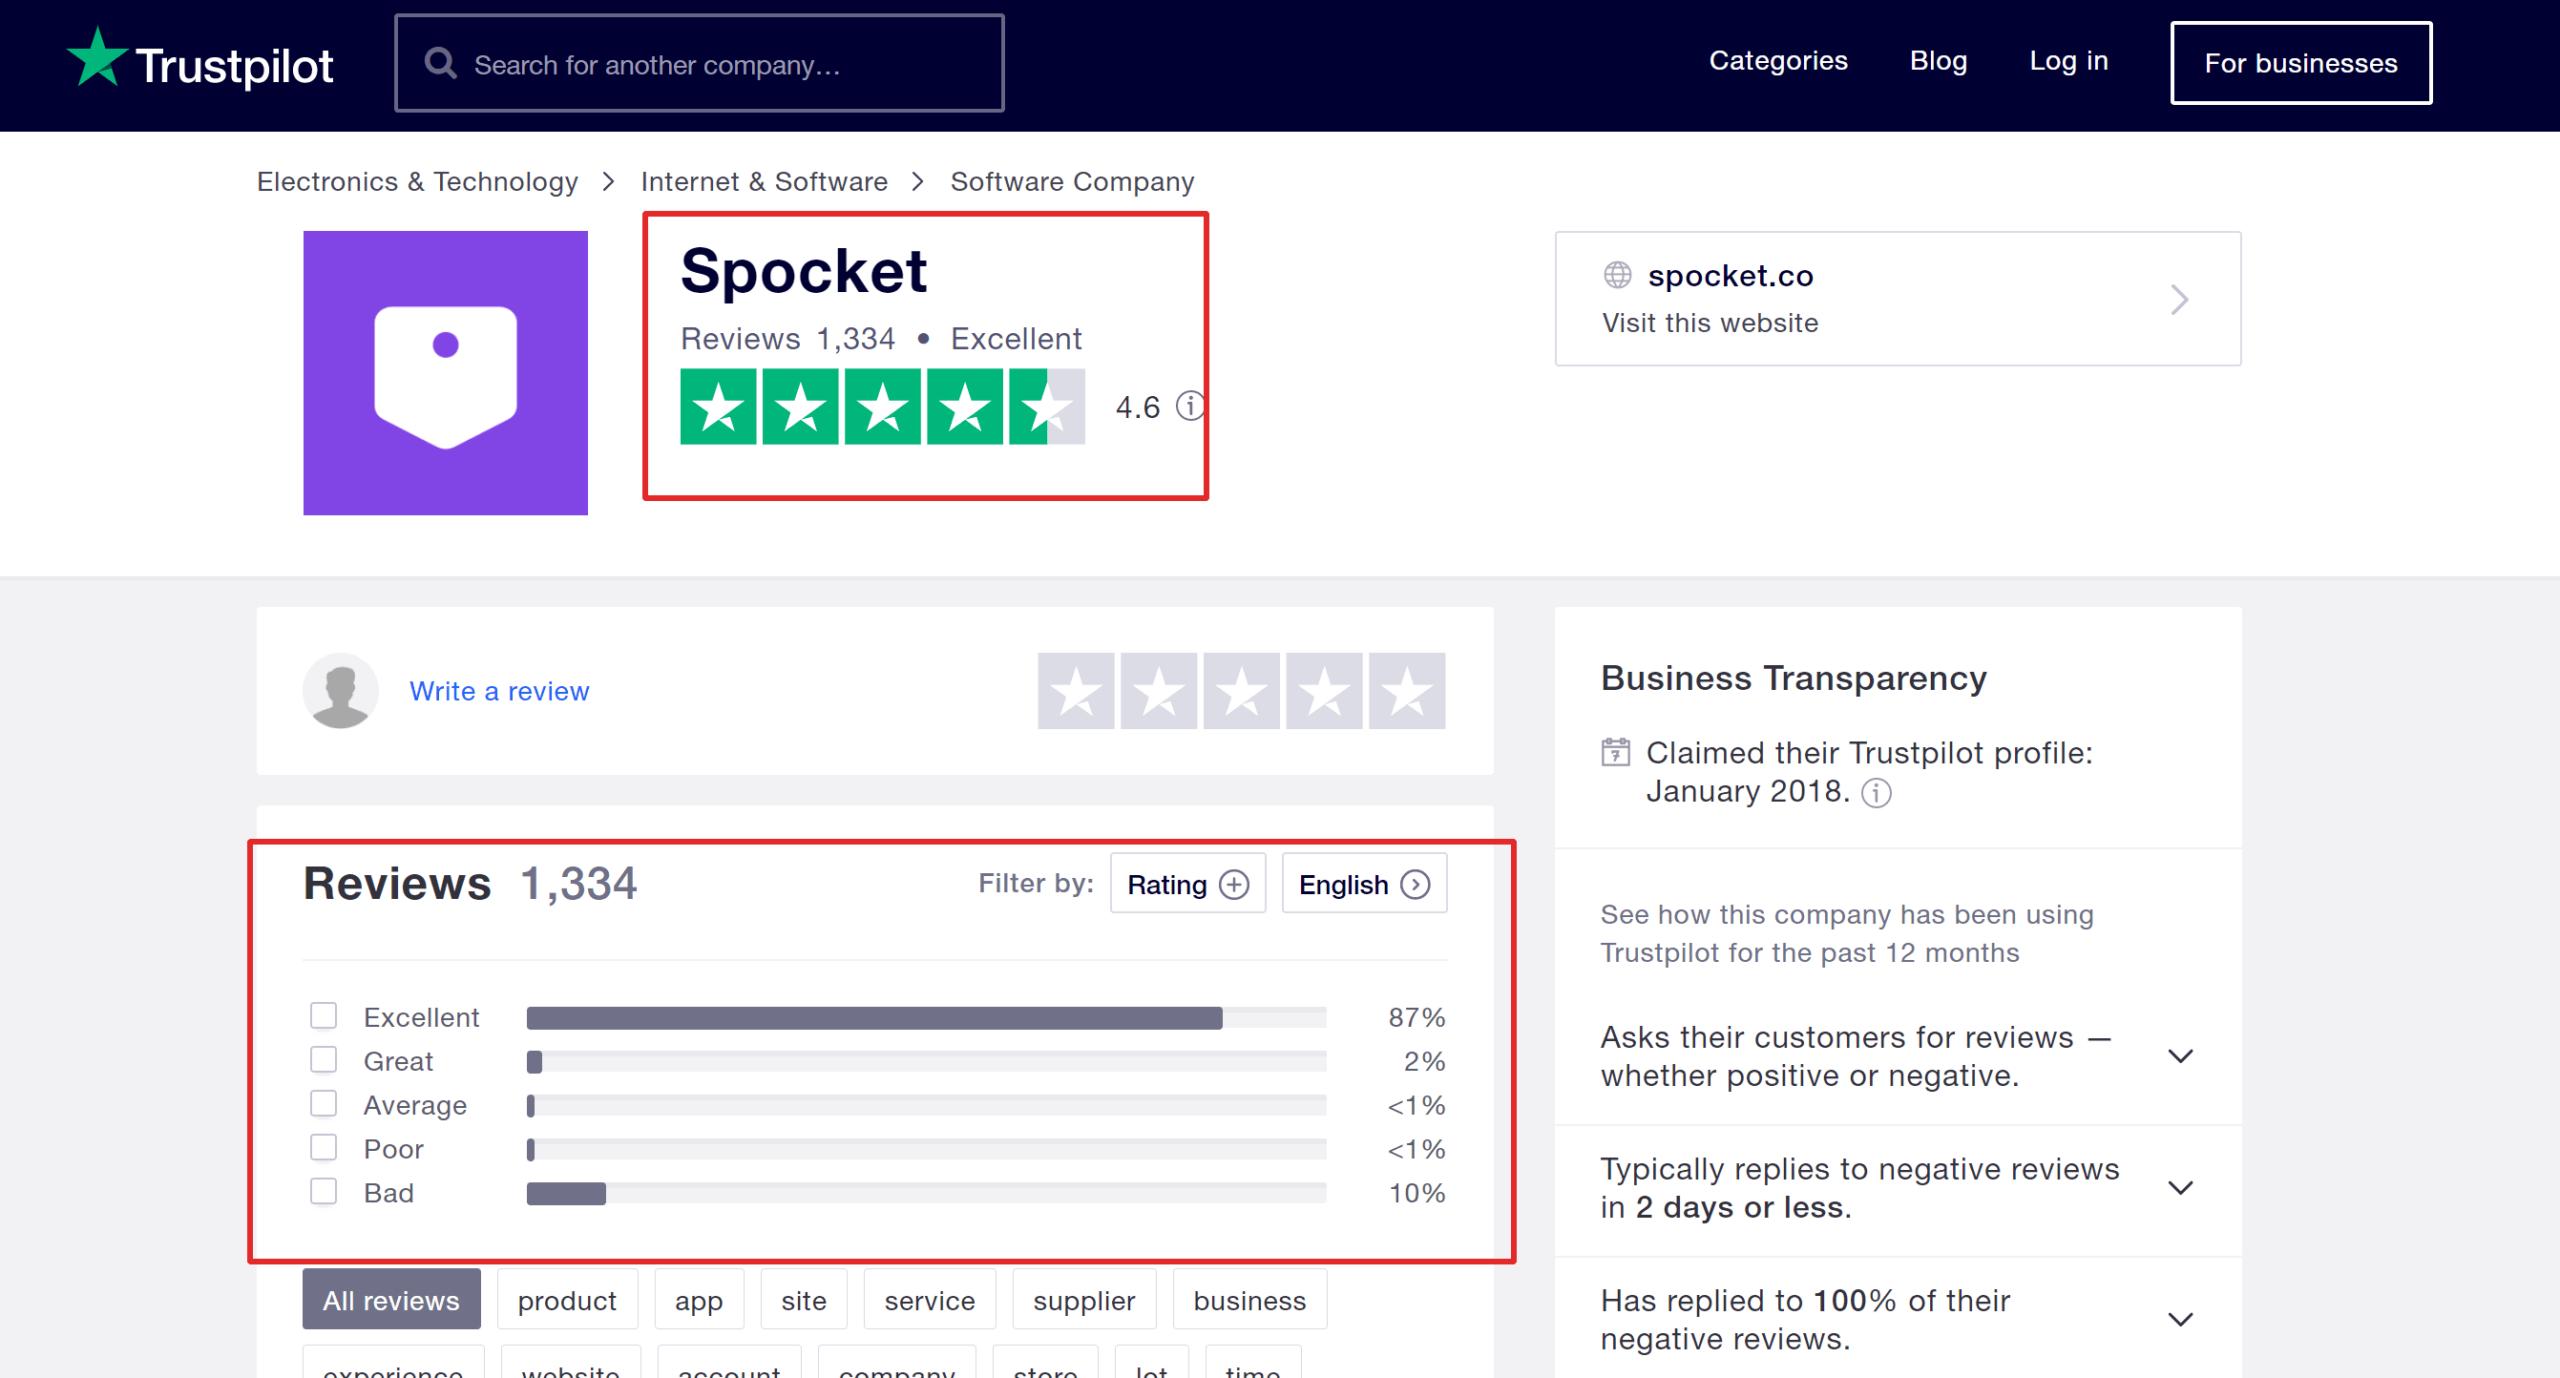 Spocket dropshipping reviews by customer